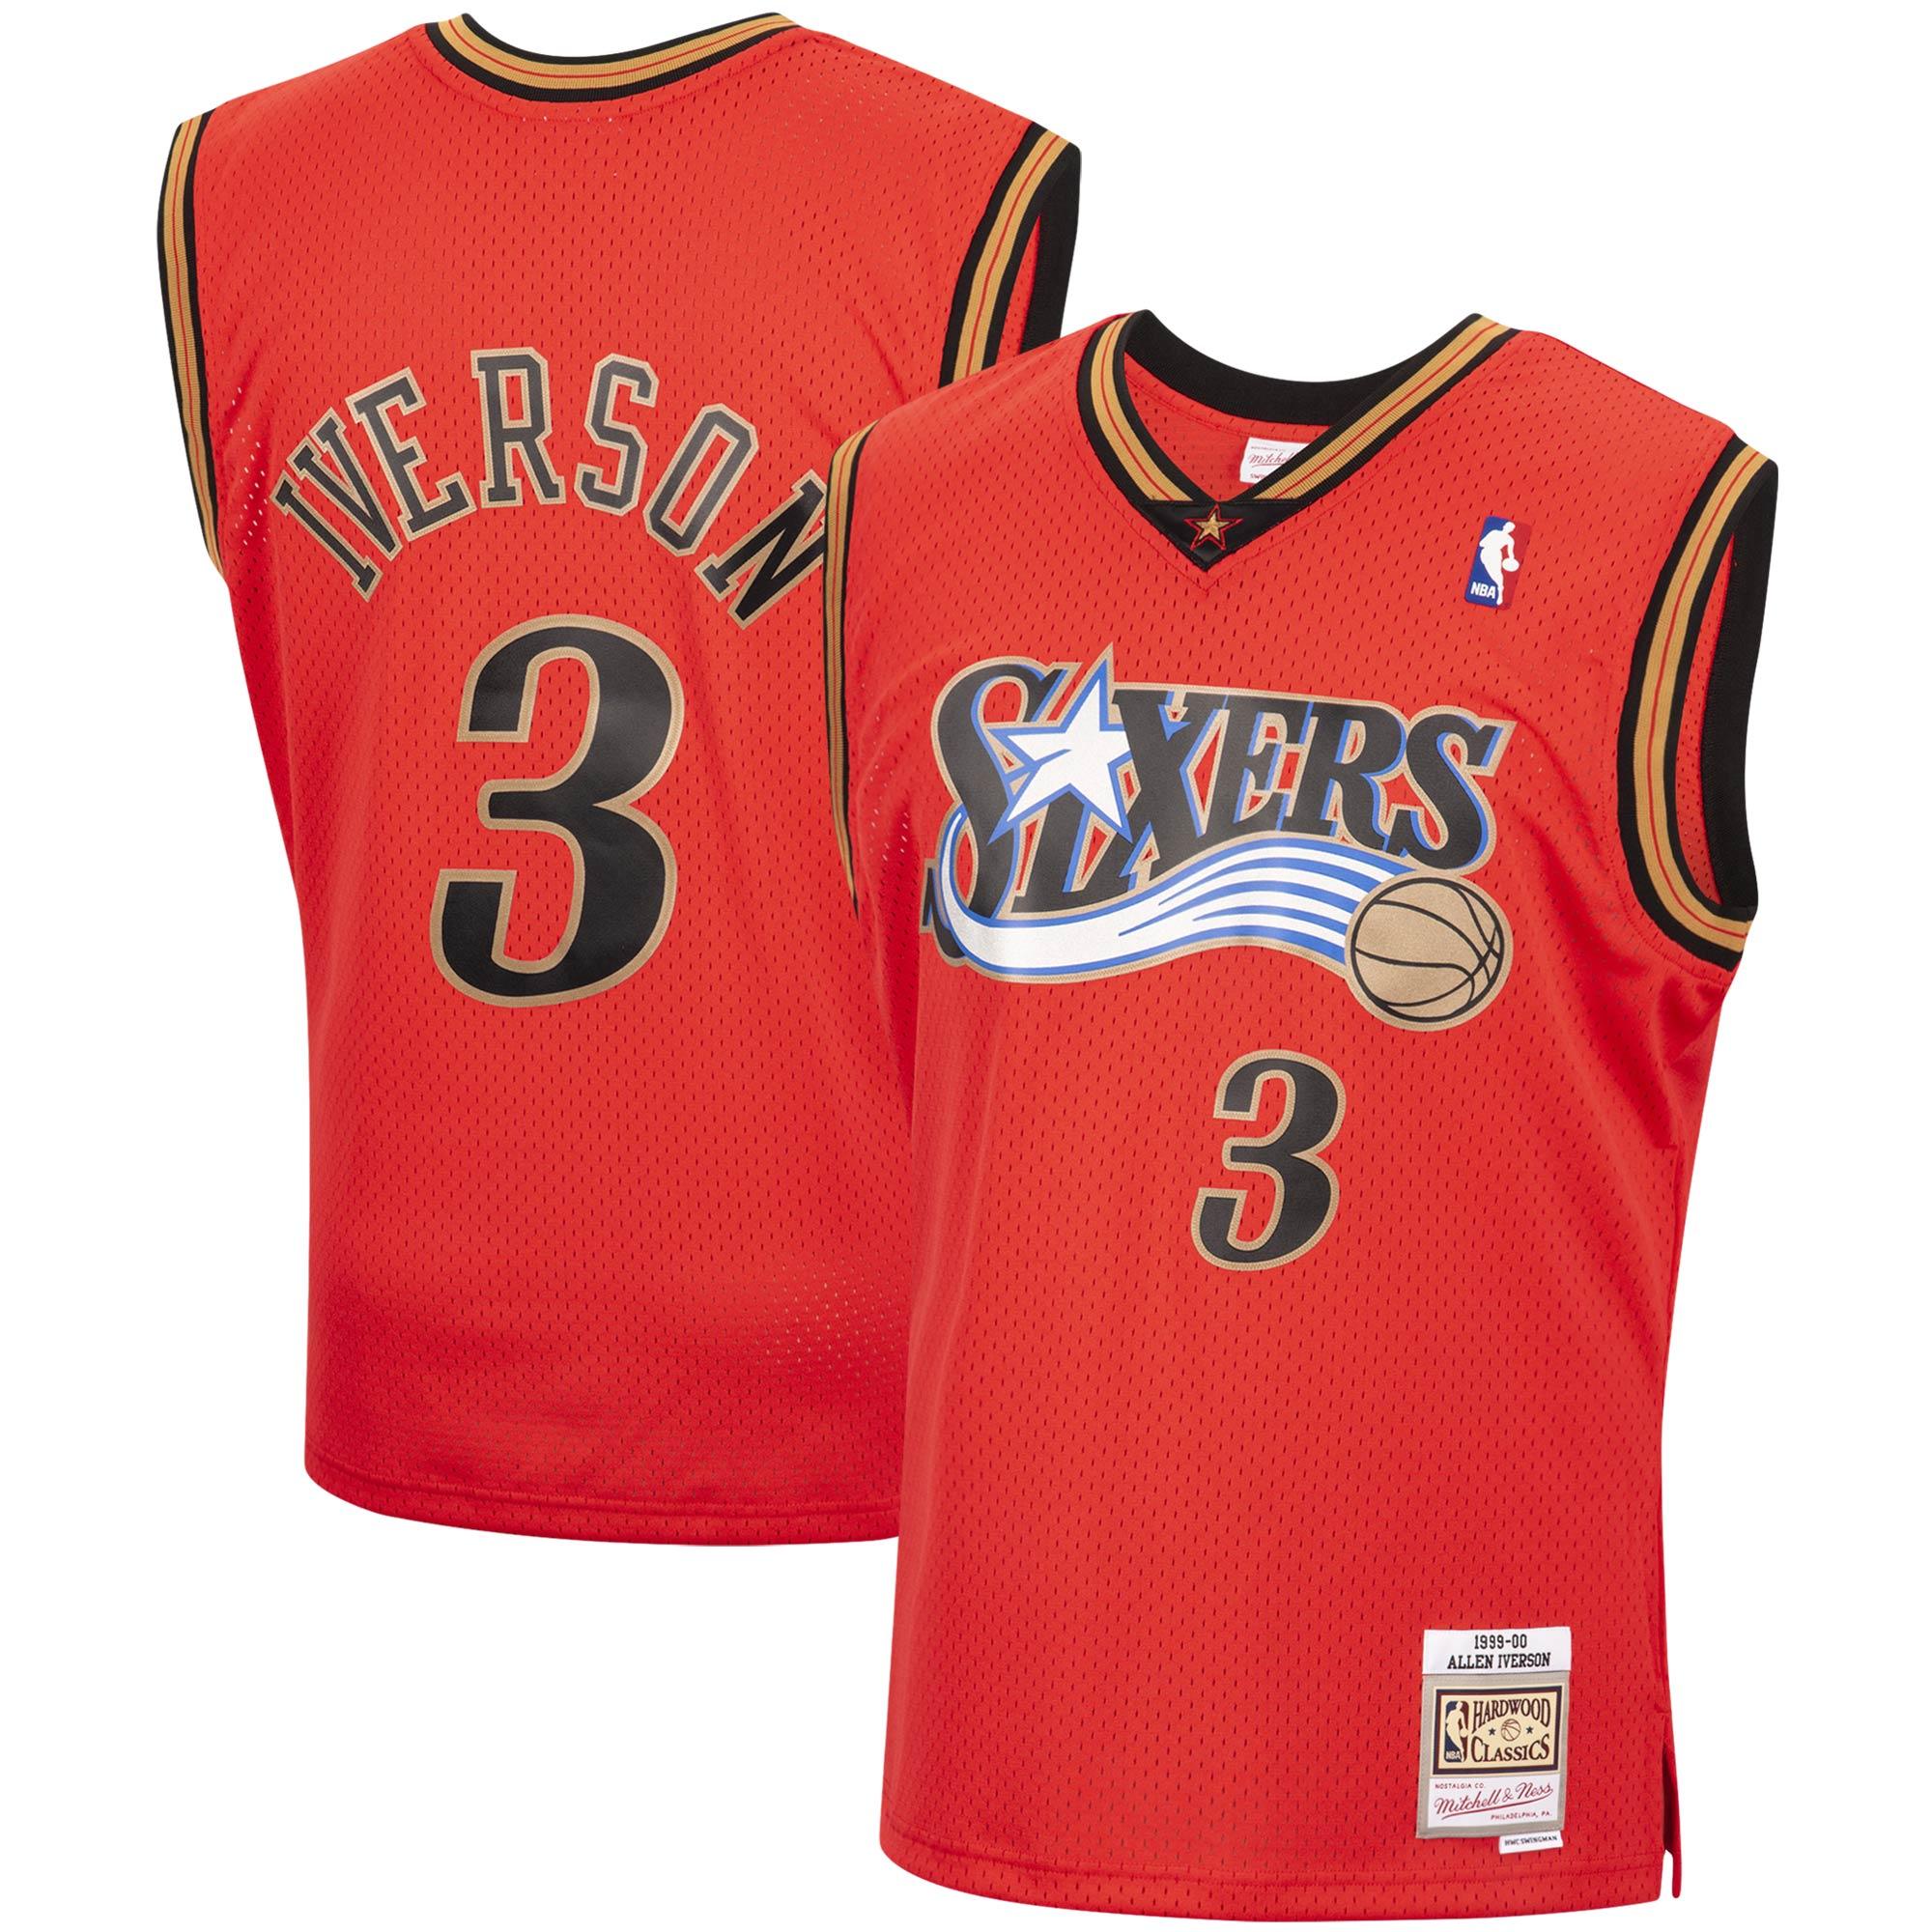 Allen Iverson Philadelphia 76ers Mitchell & Ness 1999-00 Hardwood Classics Reload Swingman Jersey - Red